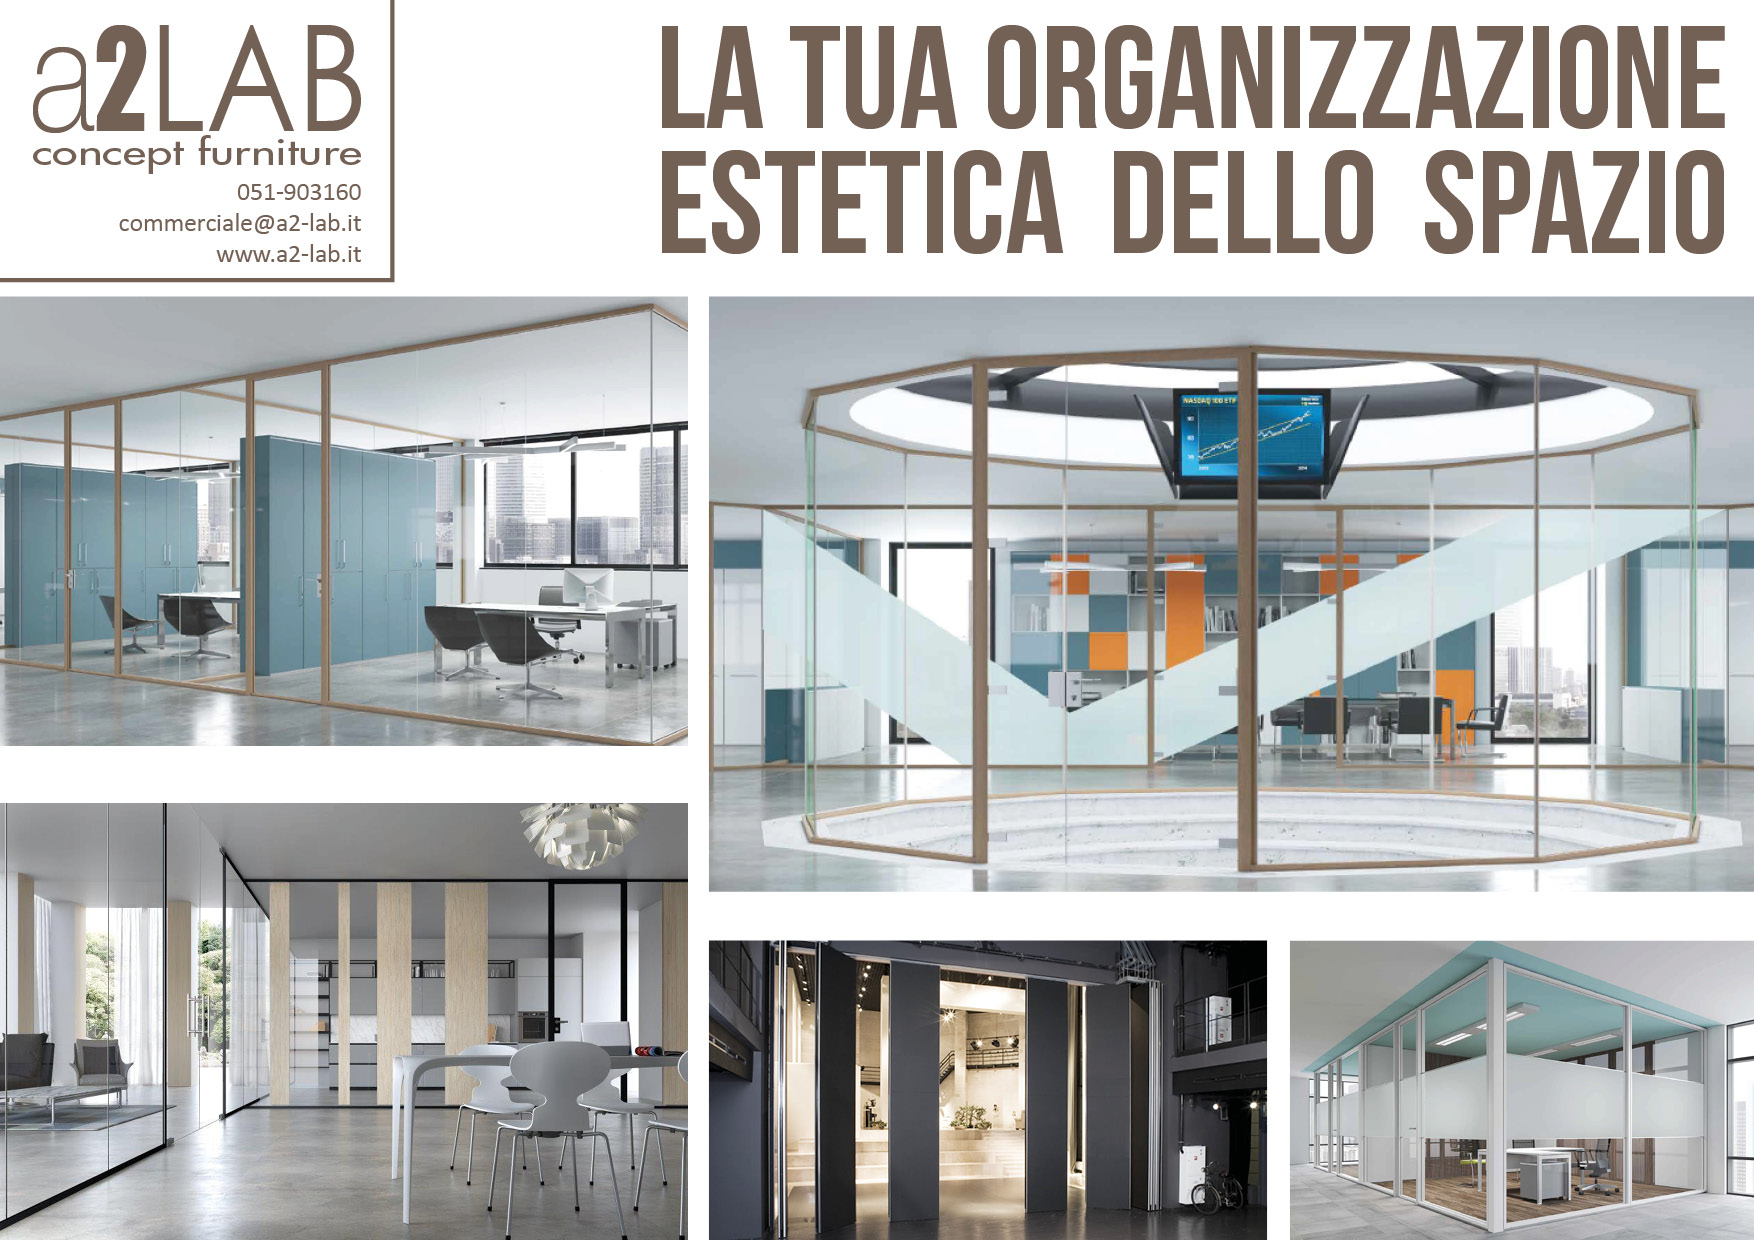 https://www.a2-lab.it/wp-content/uploads/2020/09/A2-LAB-Partizioni-Verticali.jpg